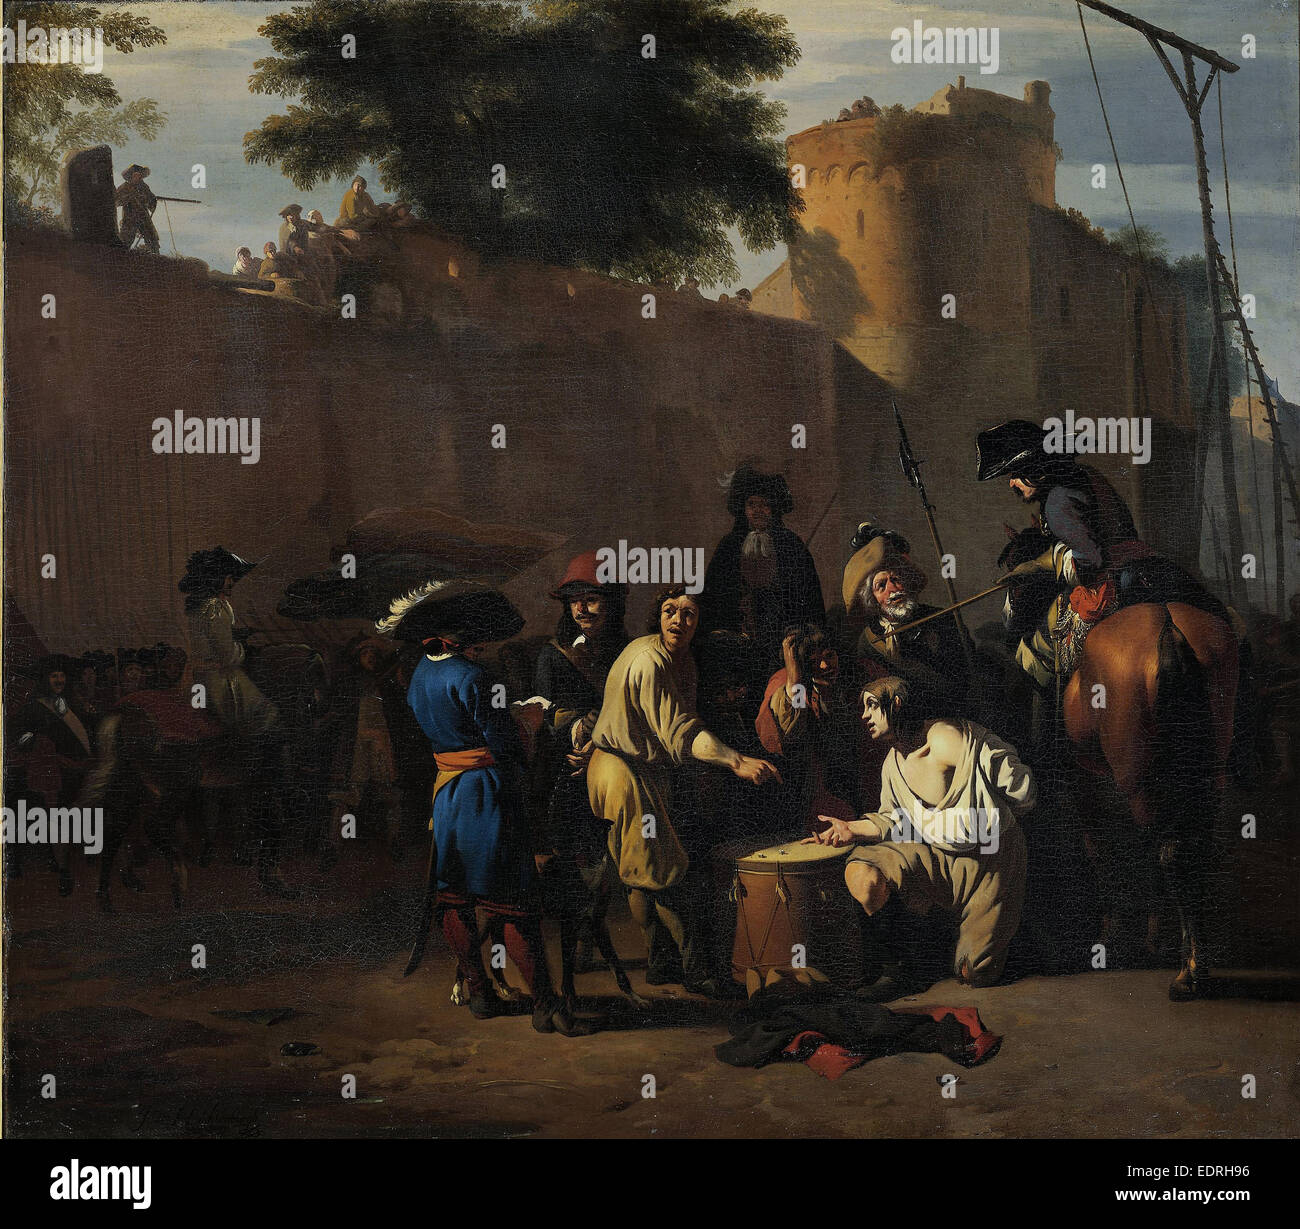 Dice Game at the Gallows, Jan van Huchtenburg, 1680 - 1720 - Stock Image